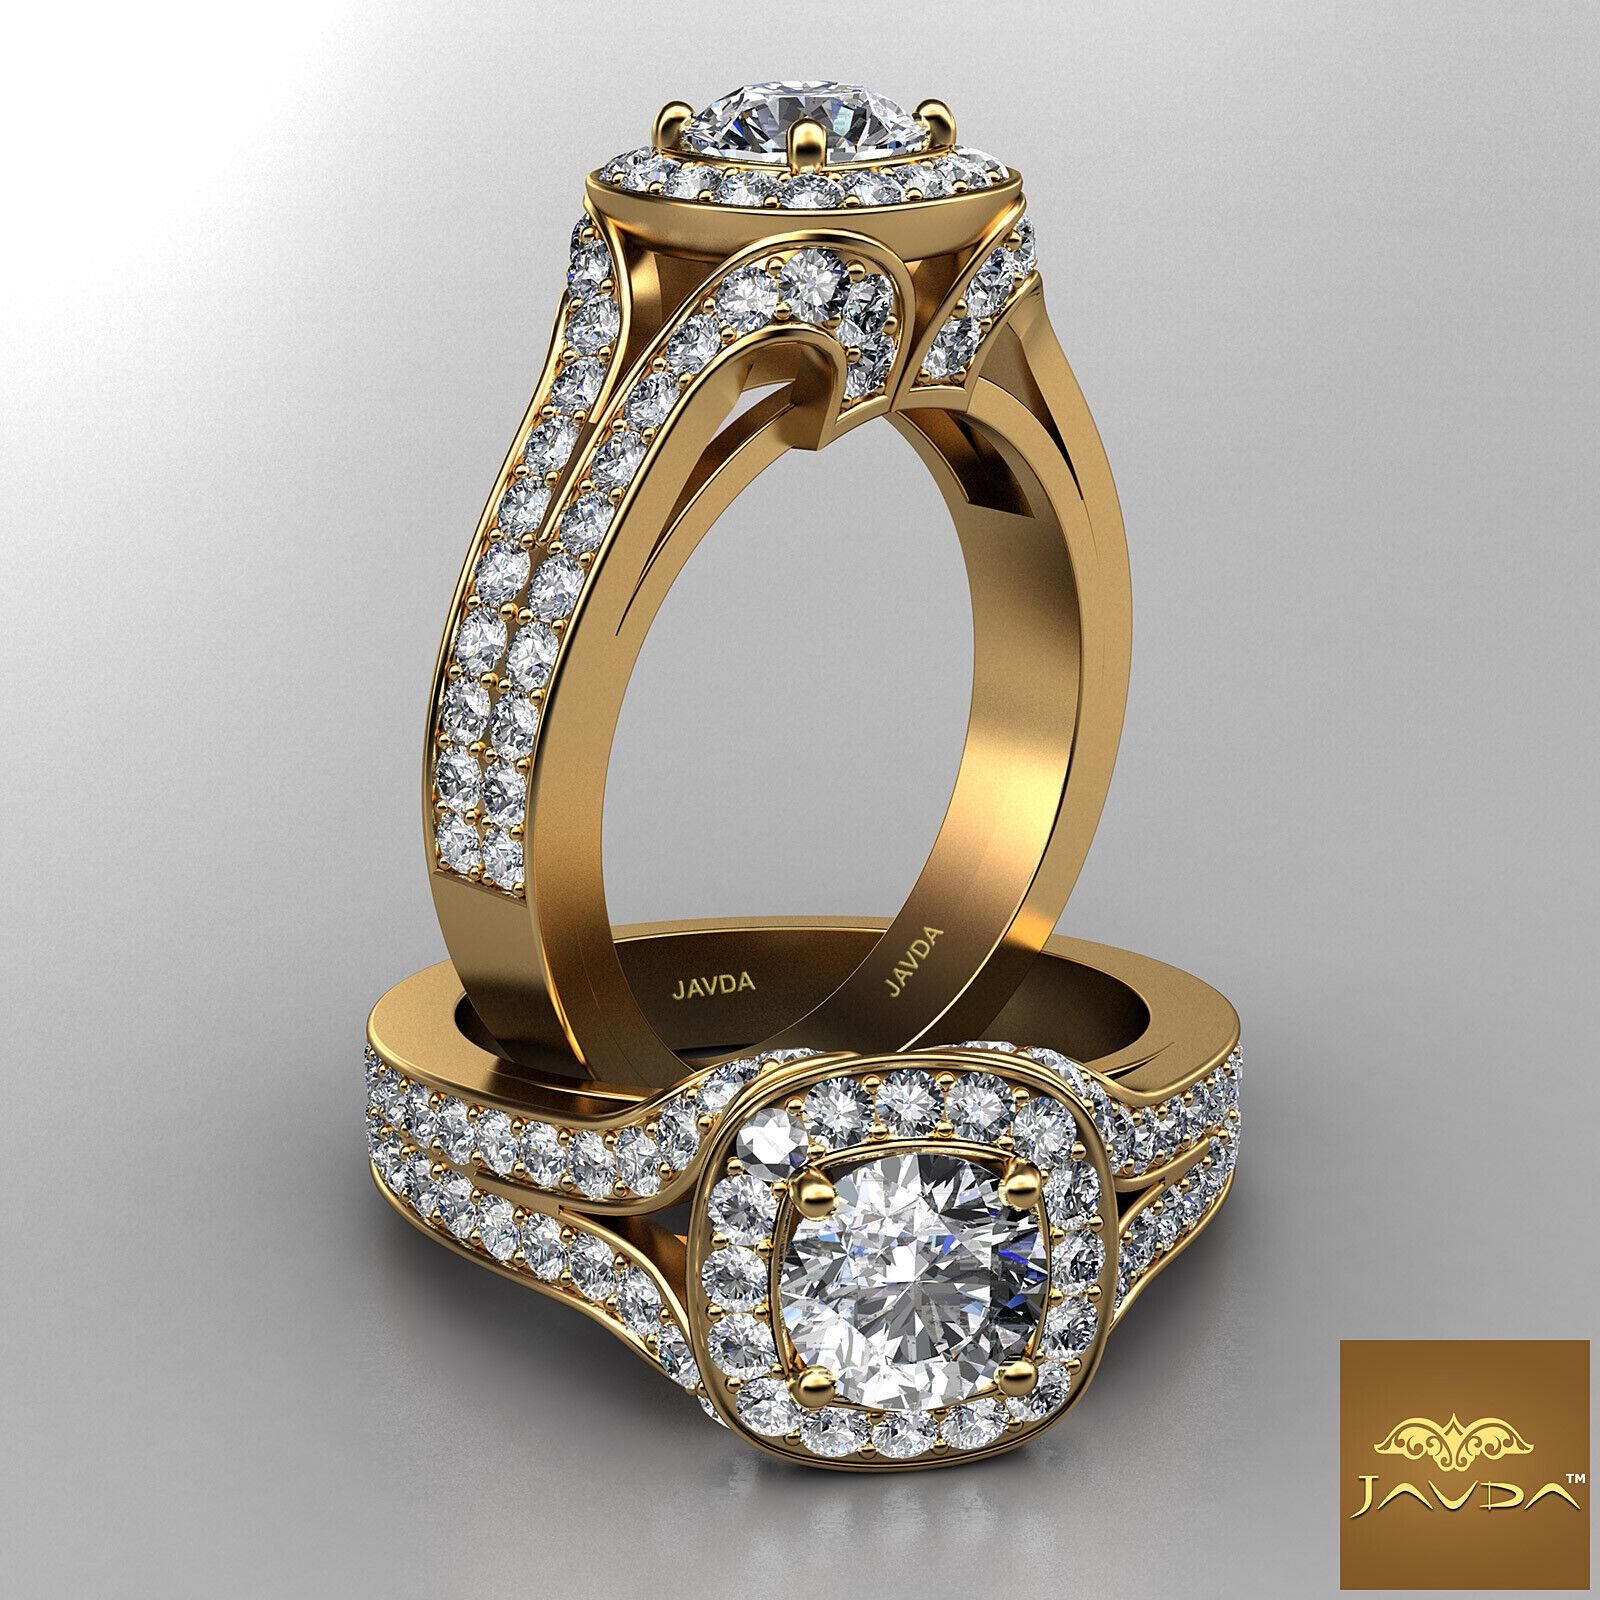 Halo Split Shank Round Diamond Engagement Pave Anniversary Ring GIA E SI1 1.9Ct